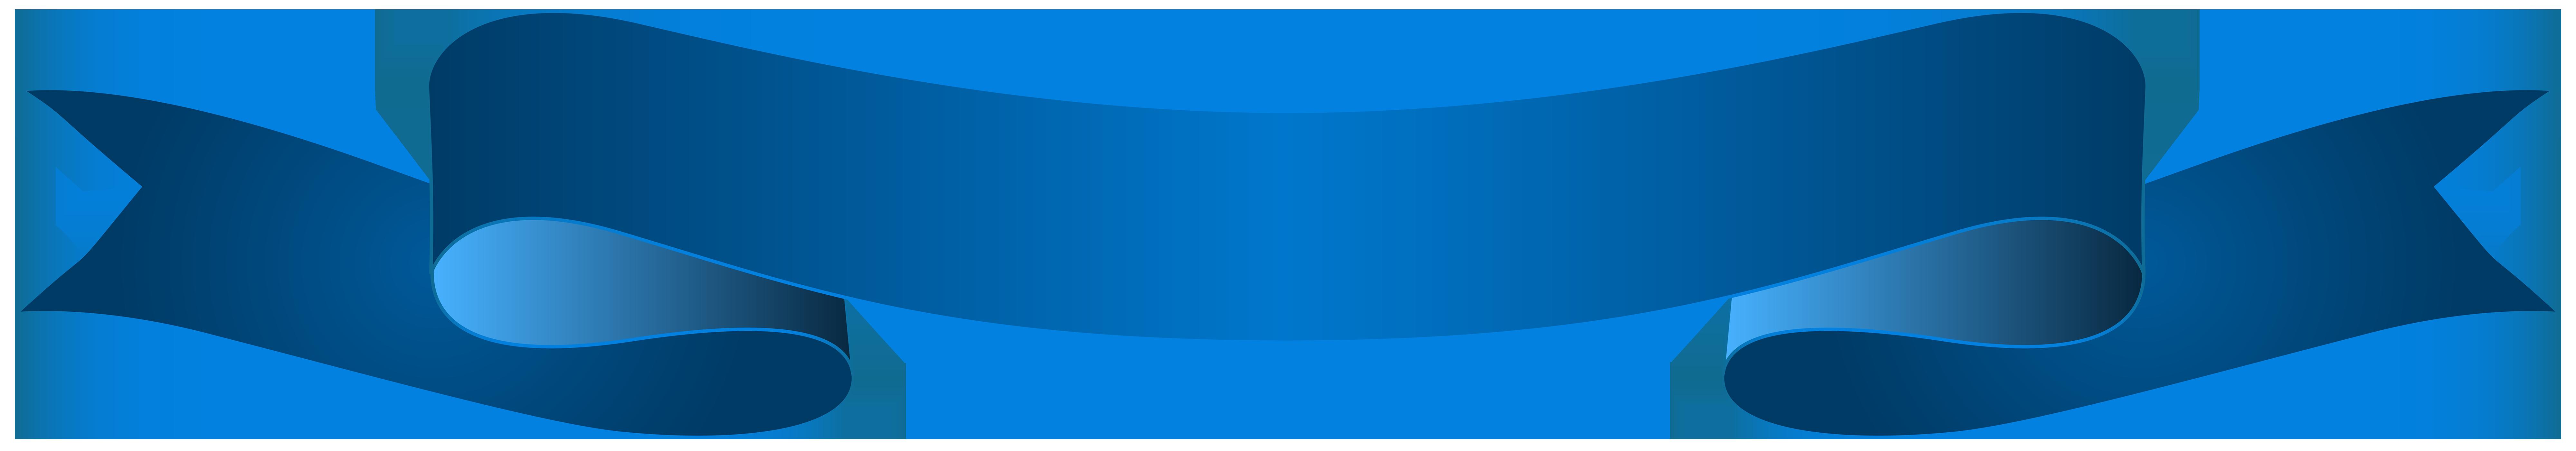 Blue Banner Transparent Clip Art Image